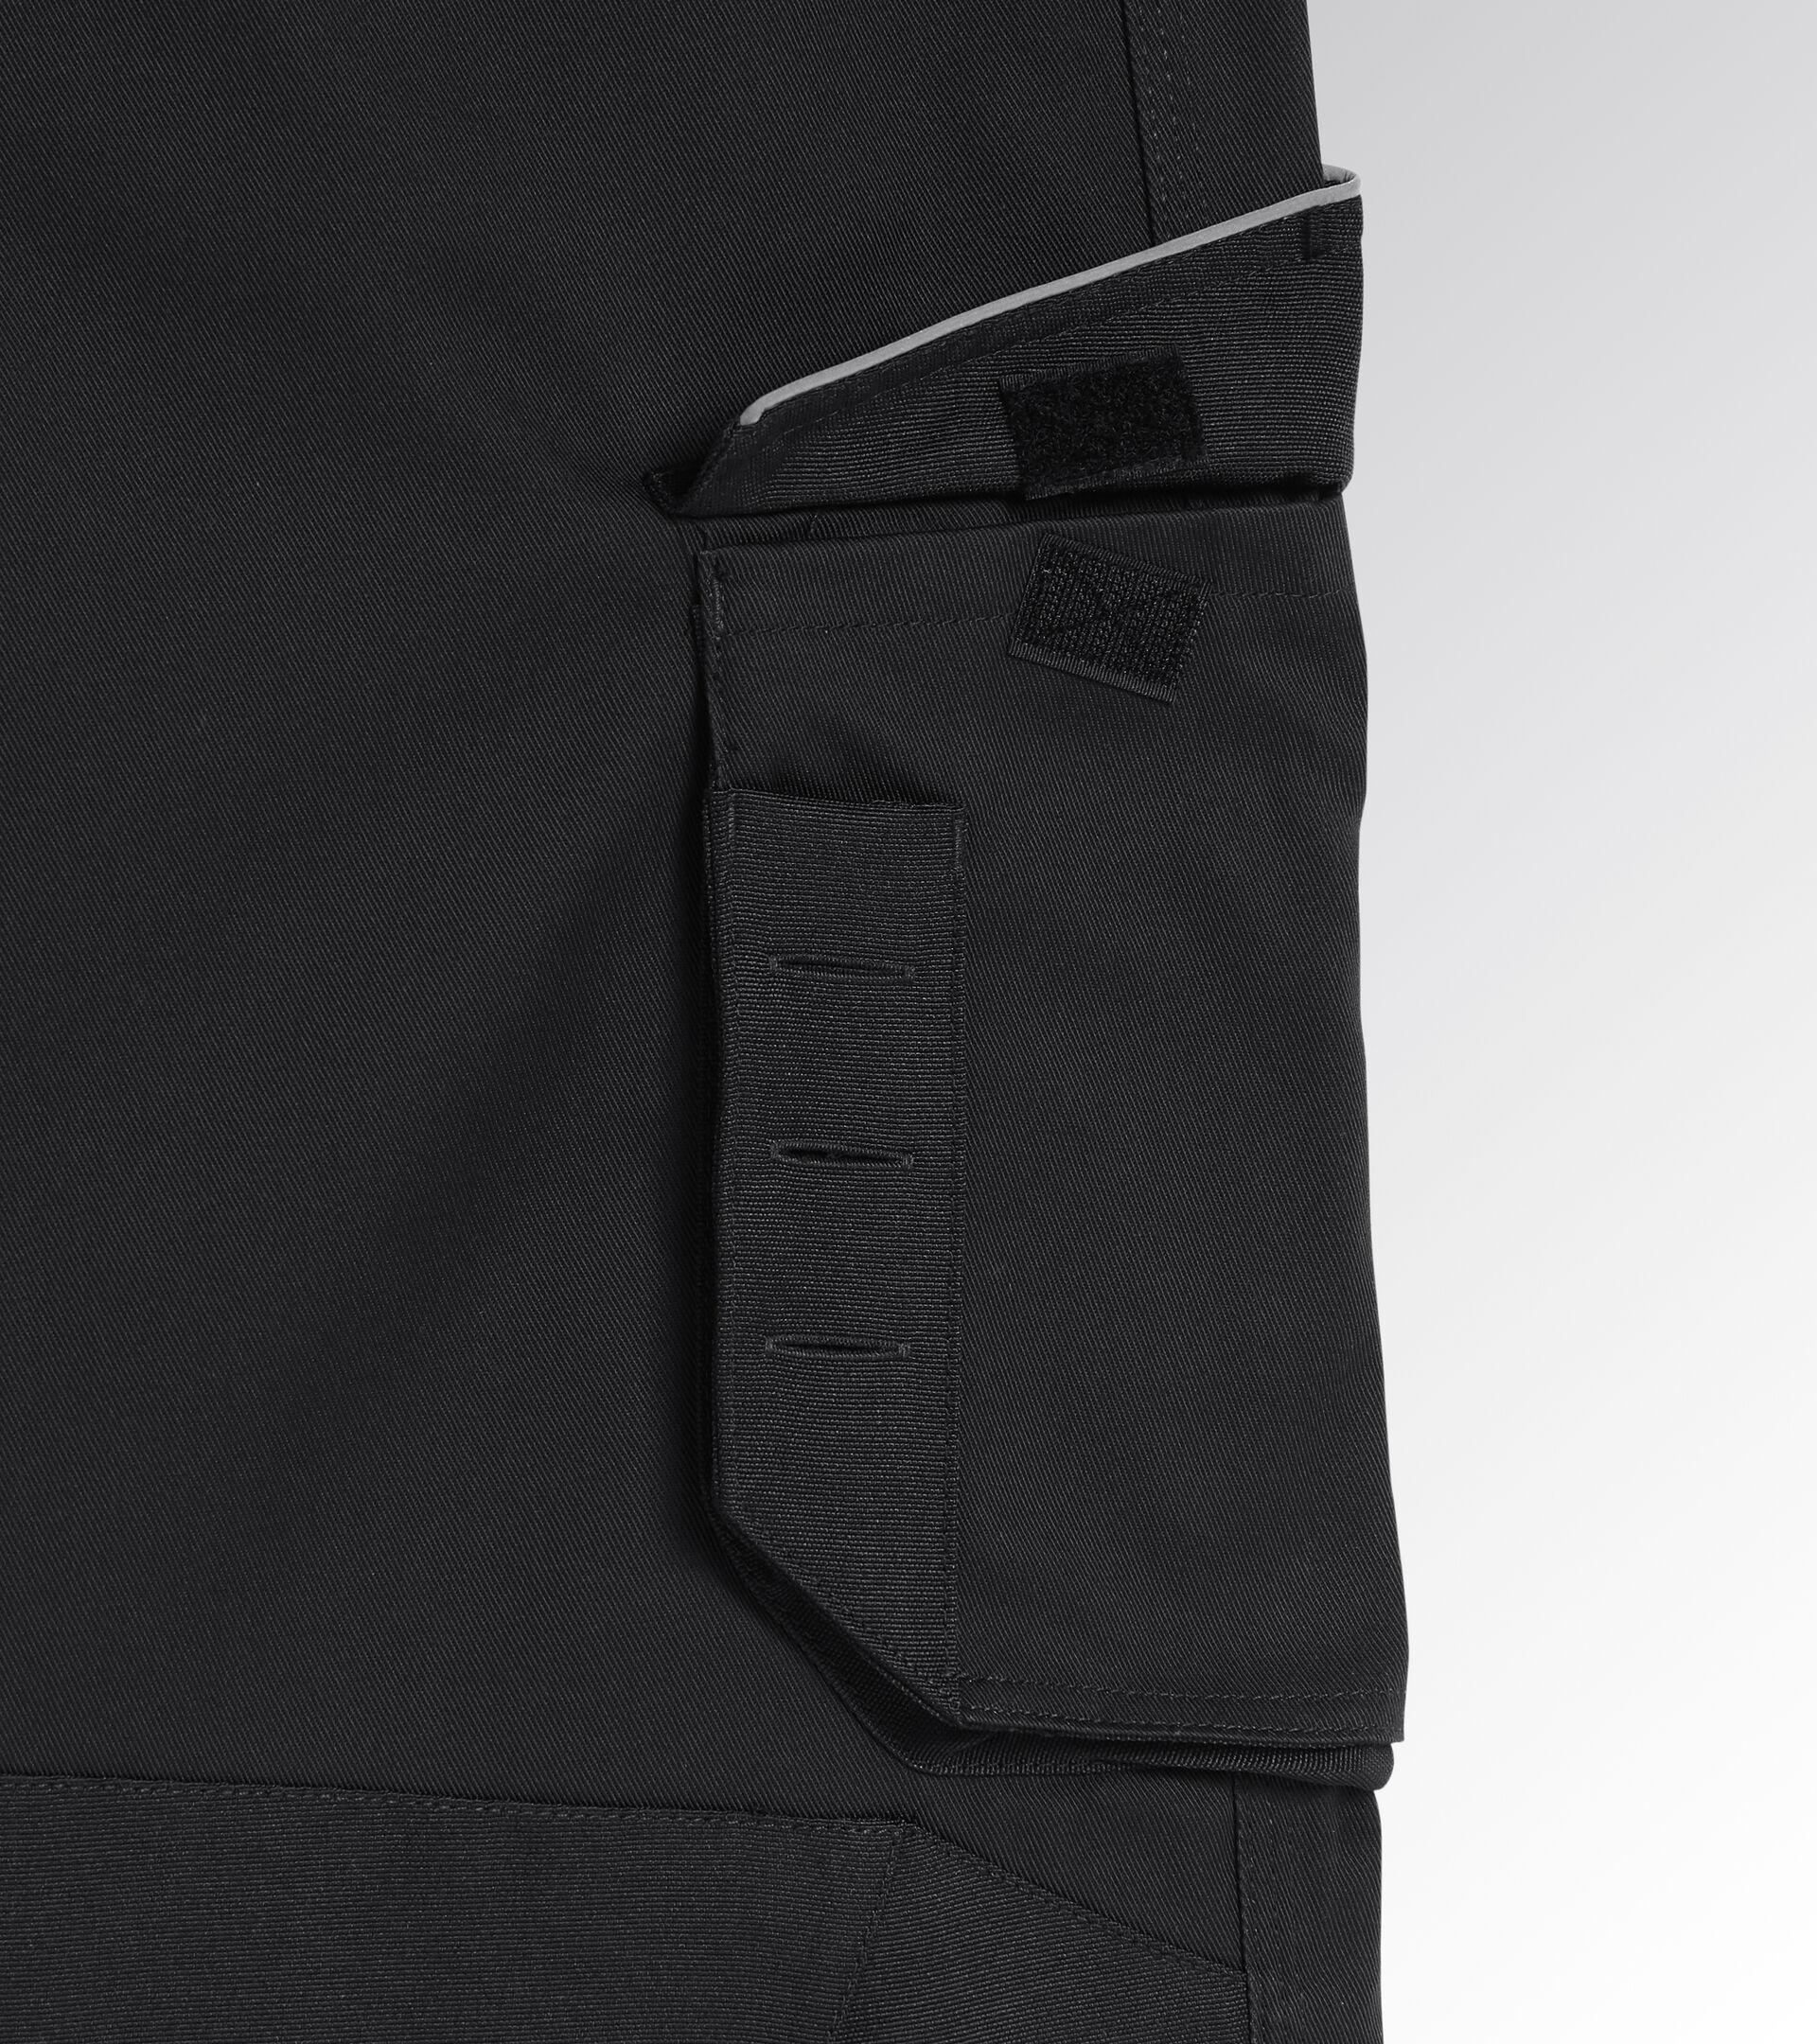 Apparel Utility UOMO PANT ROCK WINTER PERFORMANCE BLACK Utility